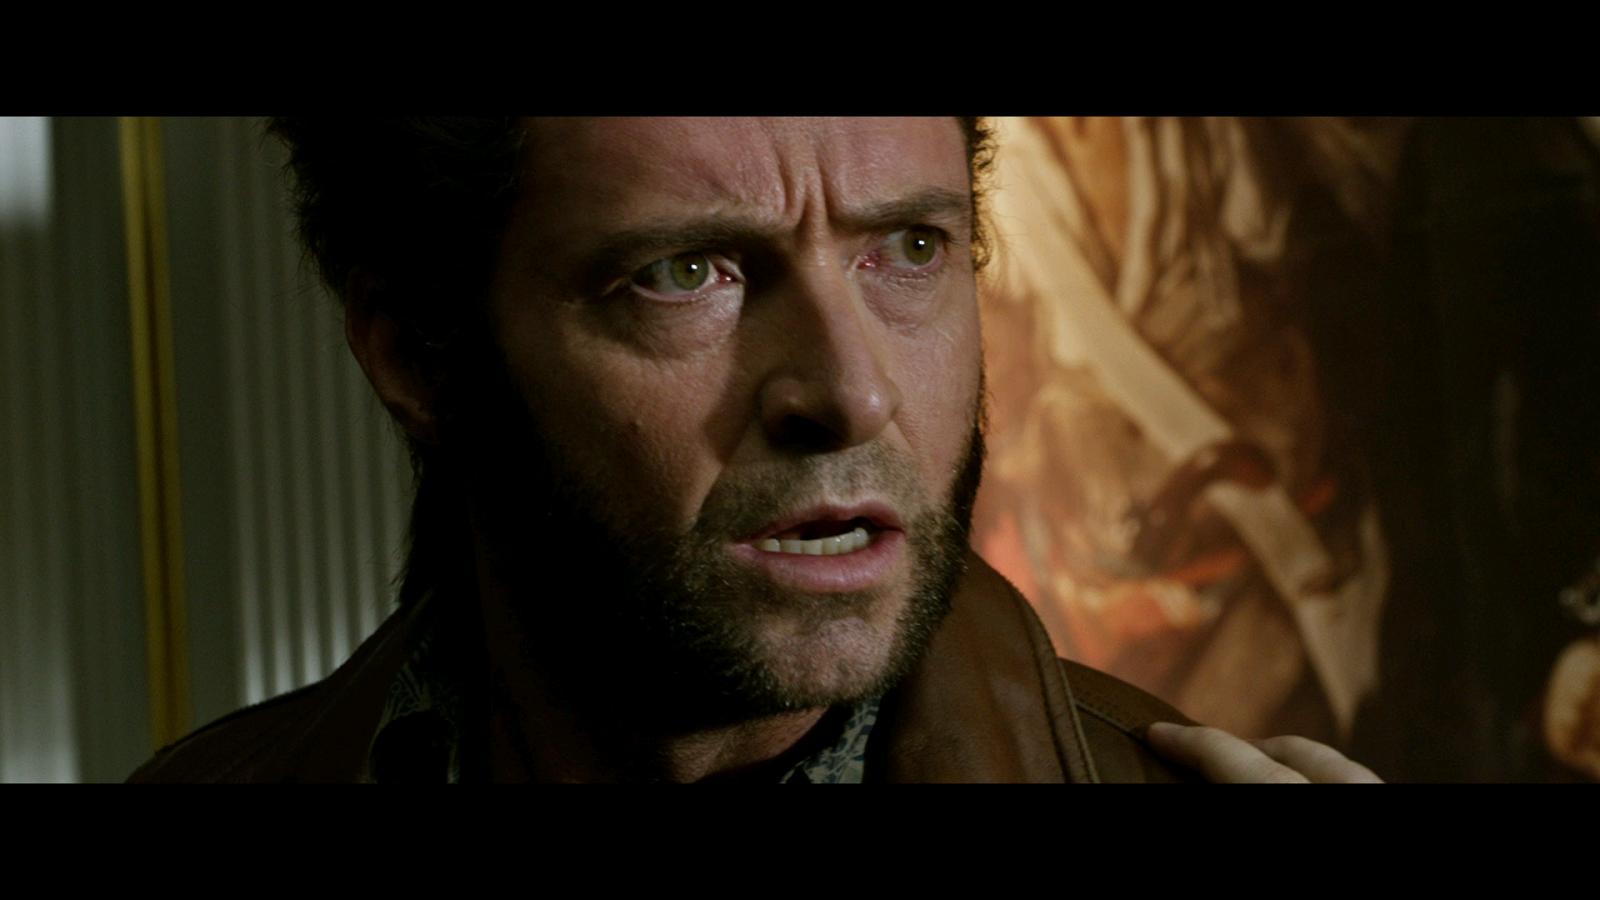 X-Men Días Del Futuro Pasado (2014) 2D + 3D 1080p BD25 2